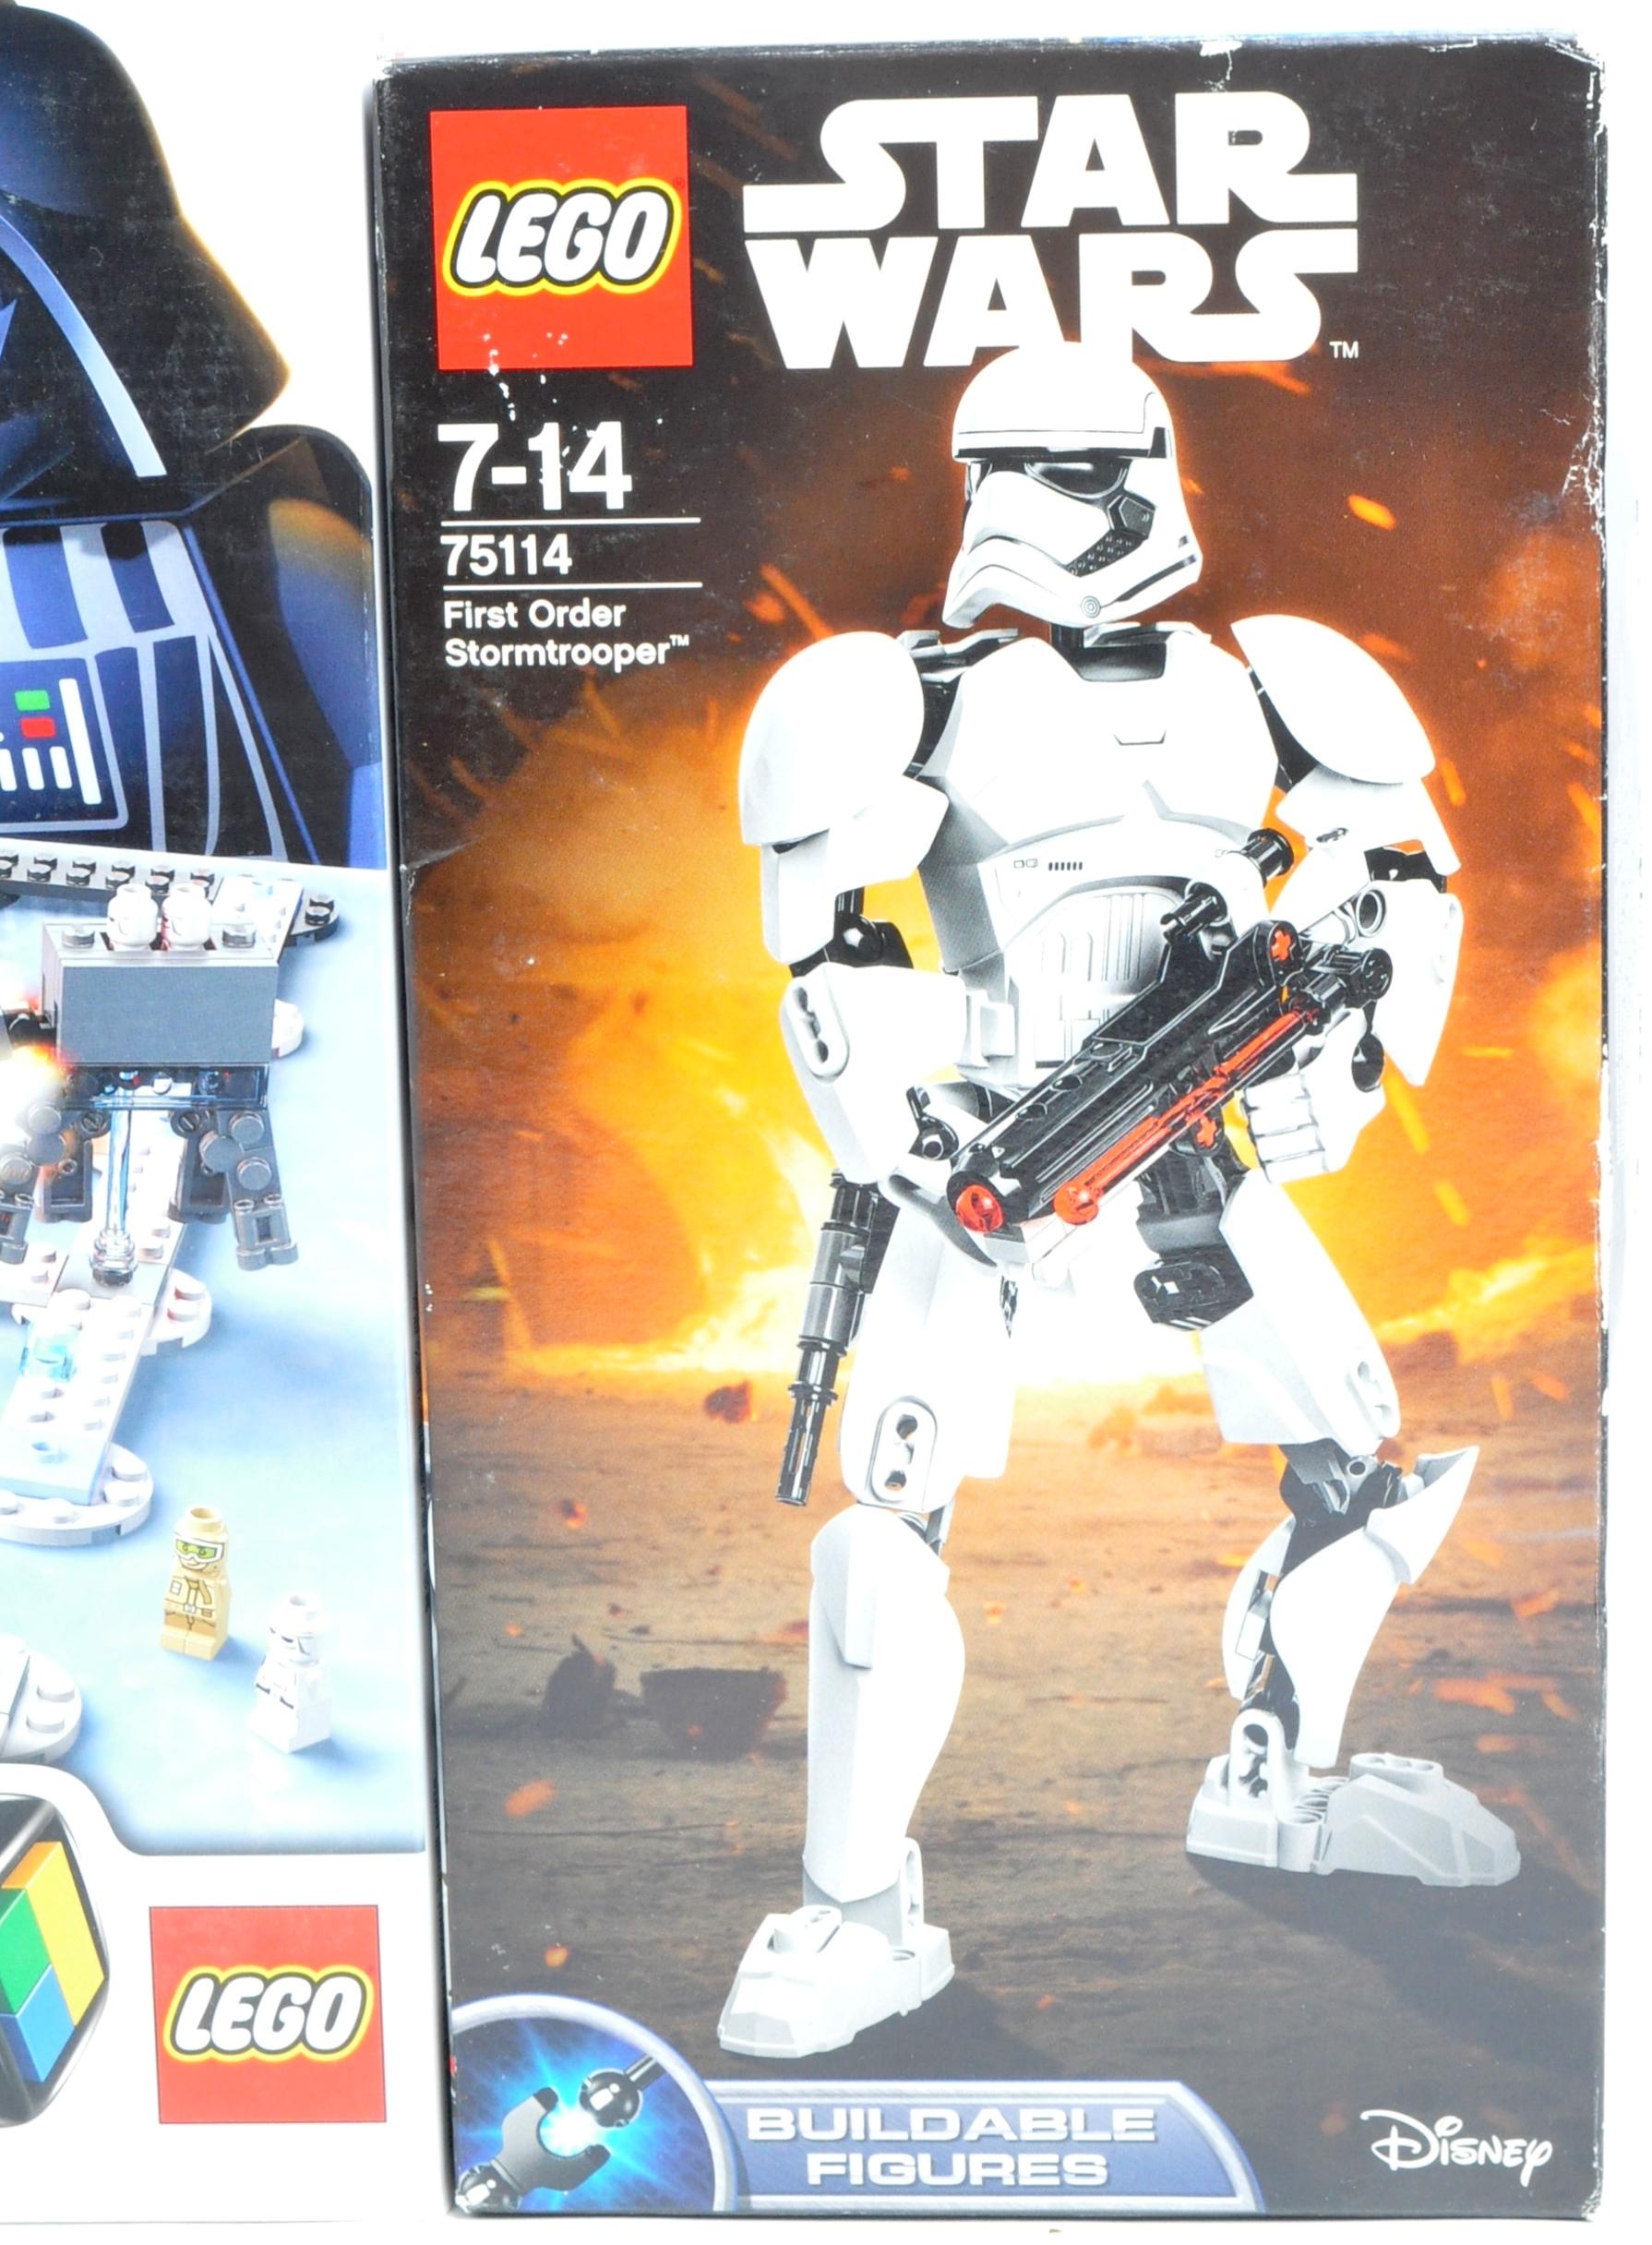 LEGO SETS - LEGO STAR WARS - 3866 / 75111 / 75114 / 75198 - Image 4 of 8